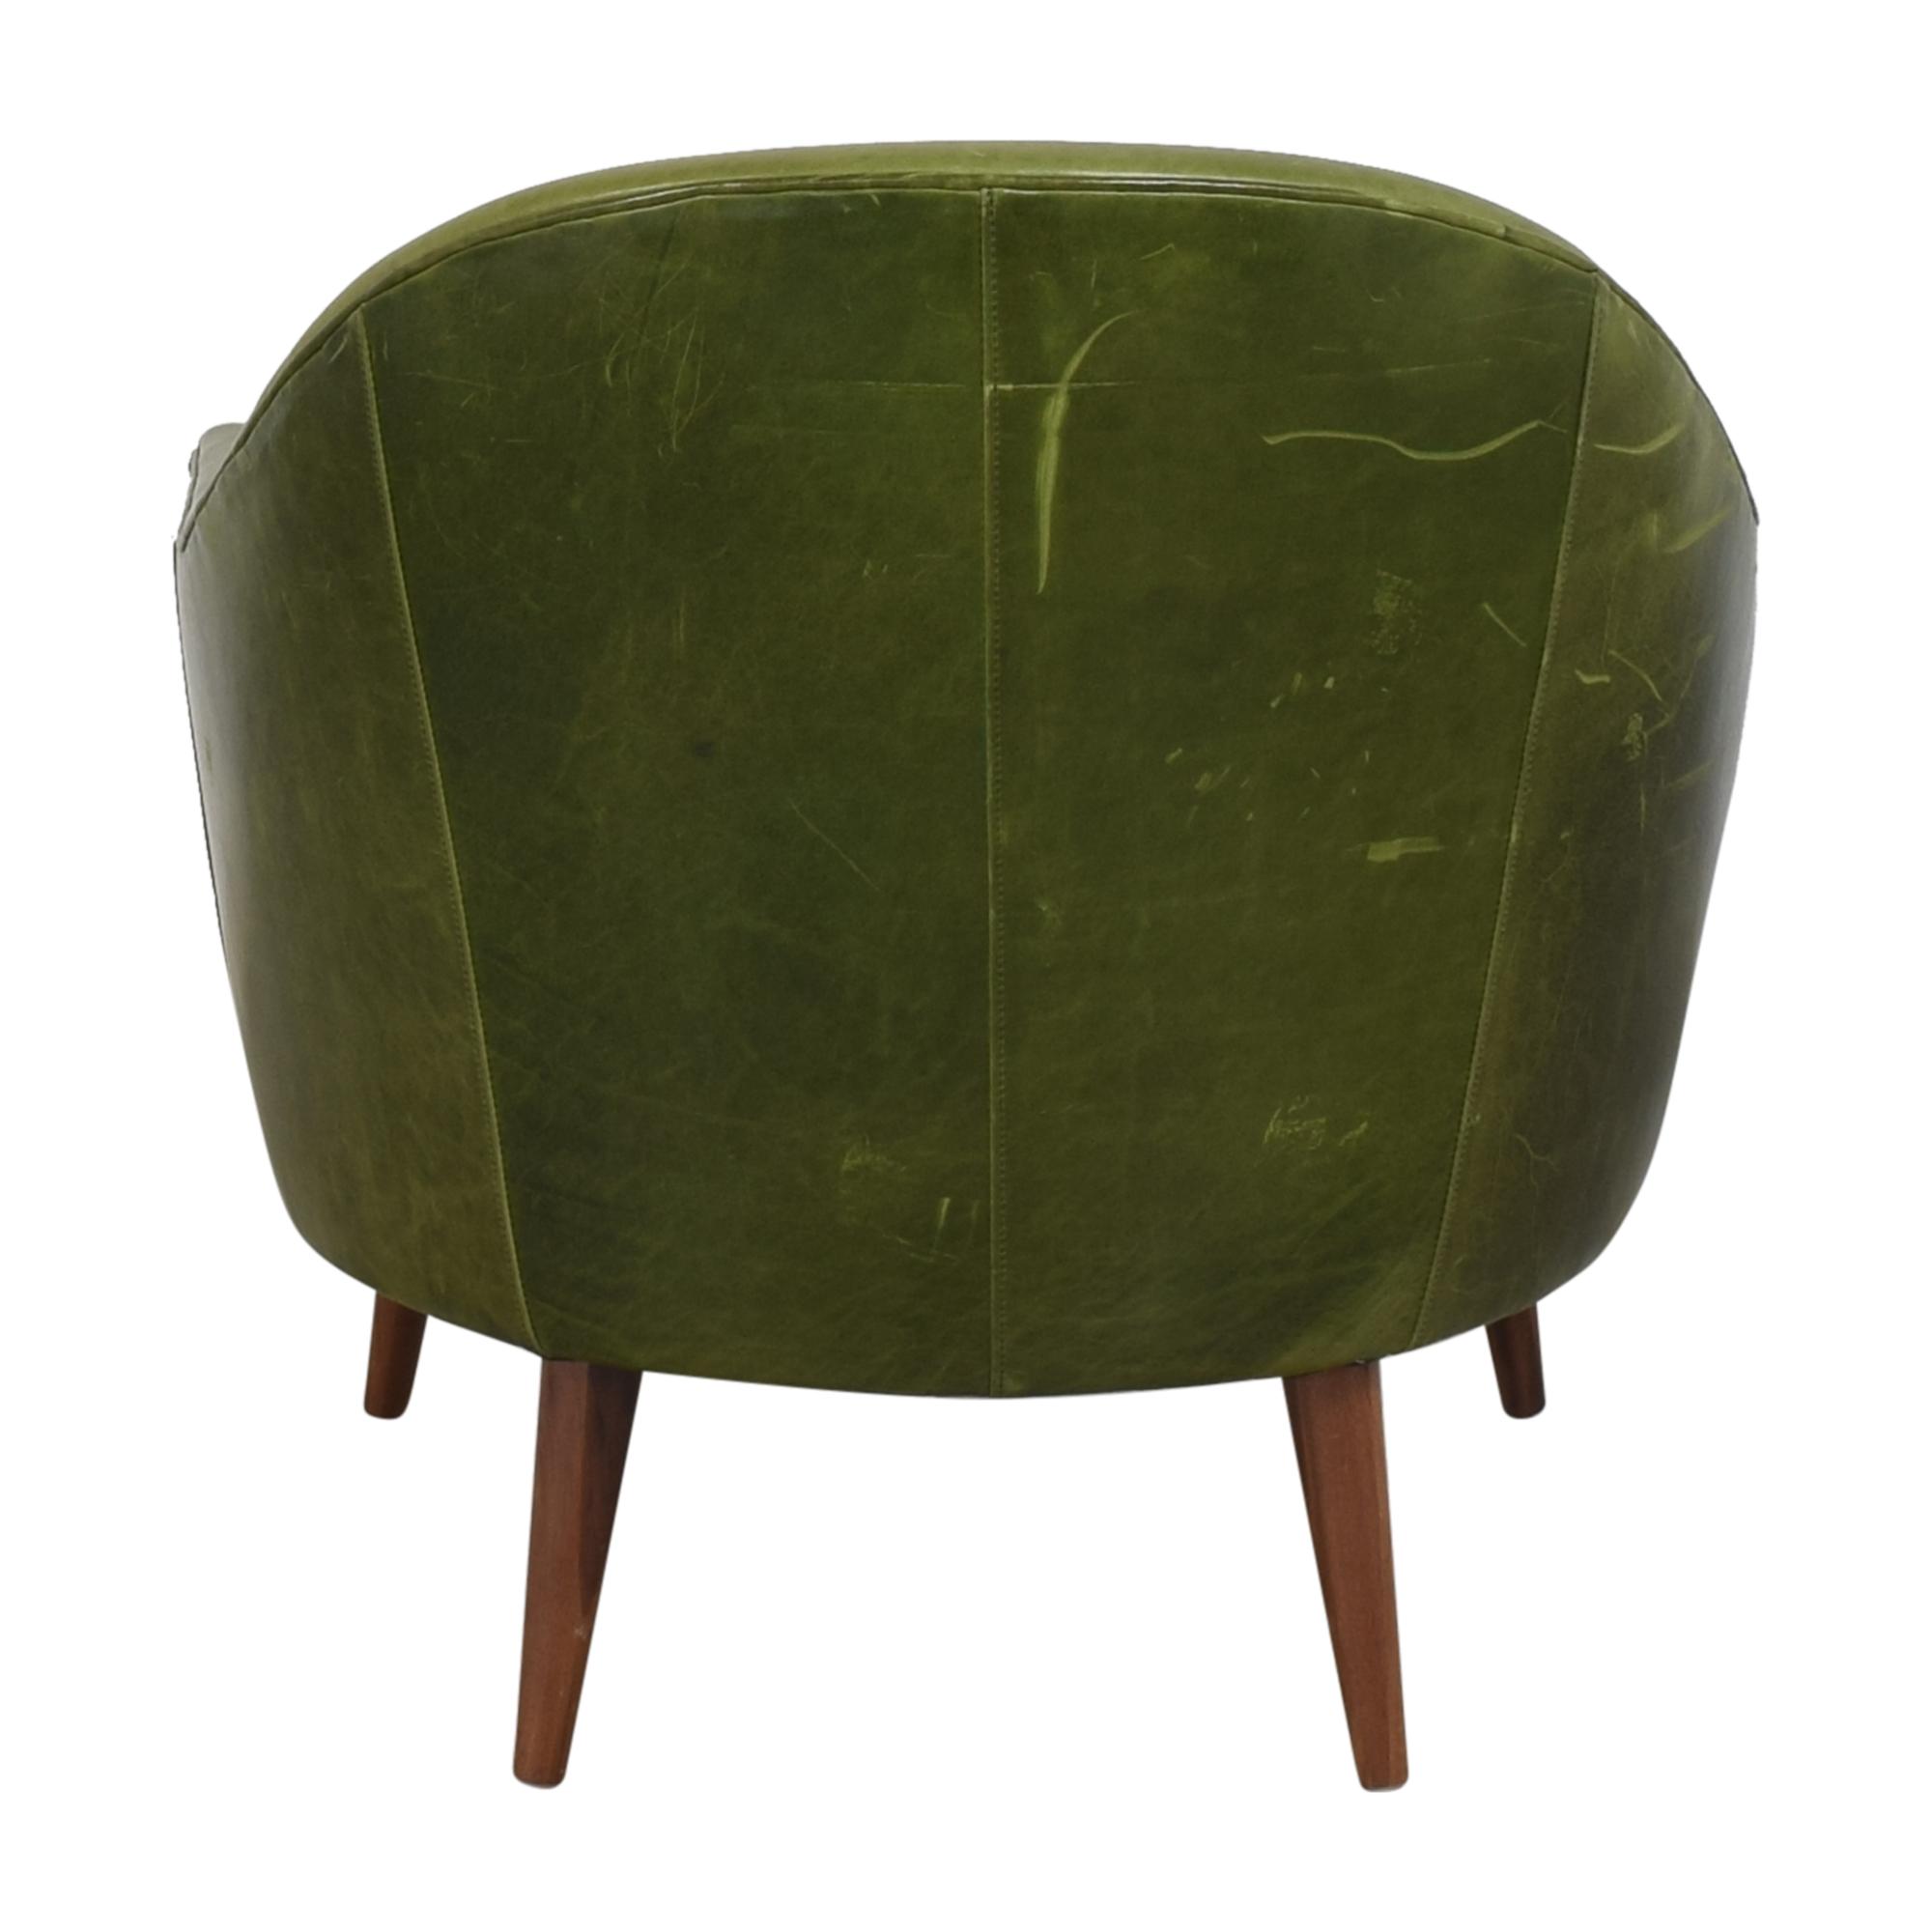 Crate & Barrel Crate & Barrel Modern Accent Chair second hand